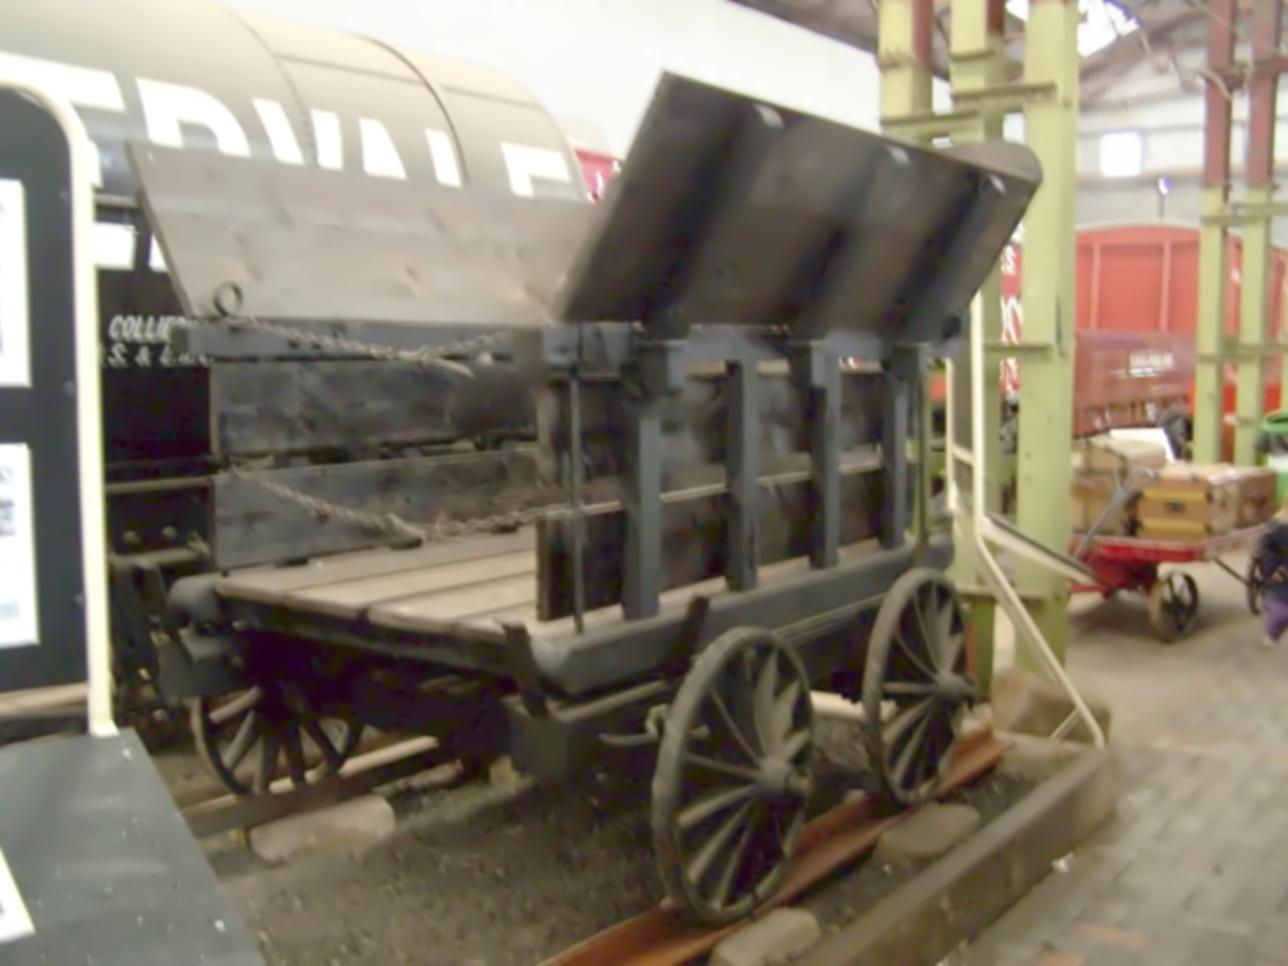 "replicaofa""ittleatonramway""wagon,thetracksareplateways"